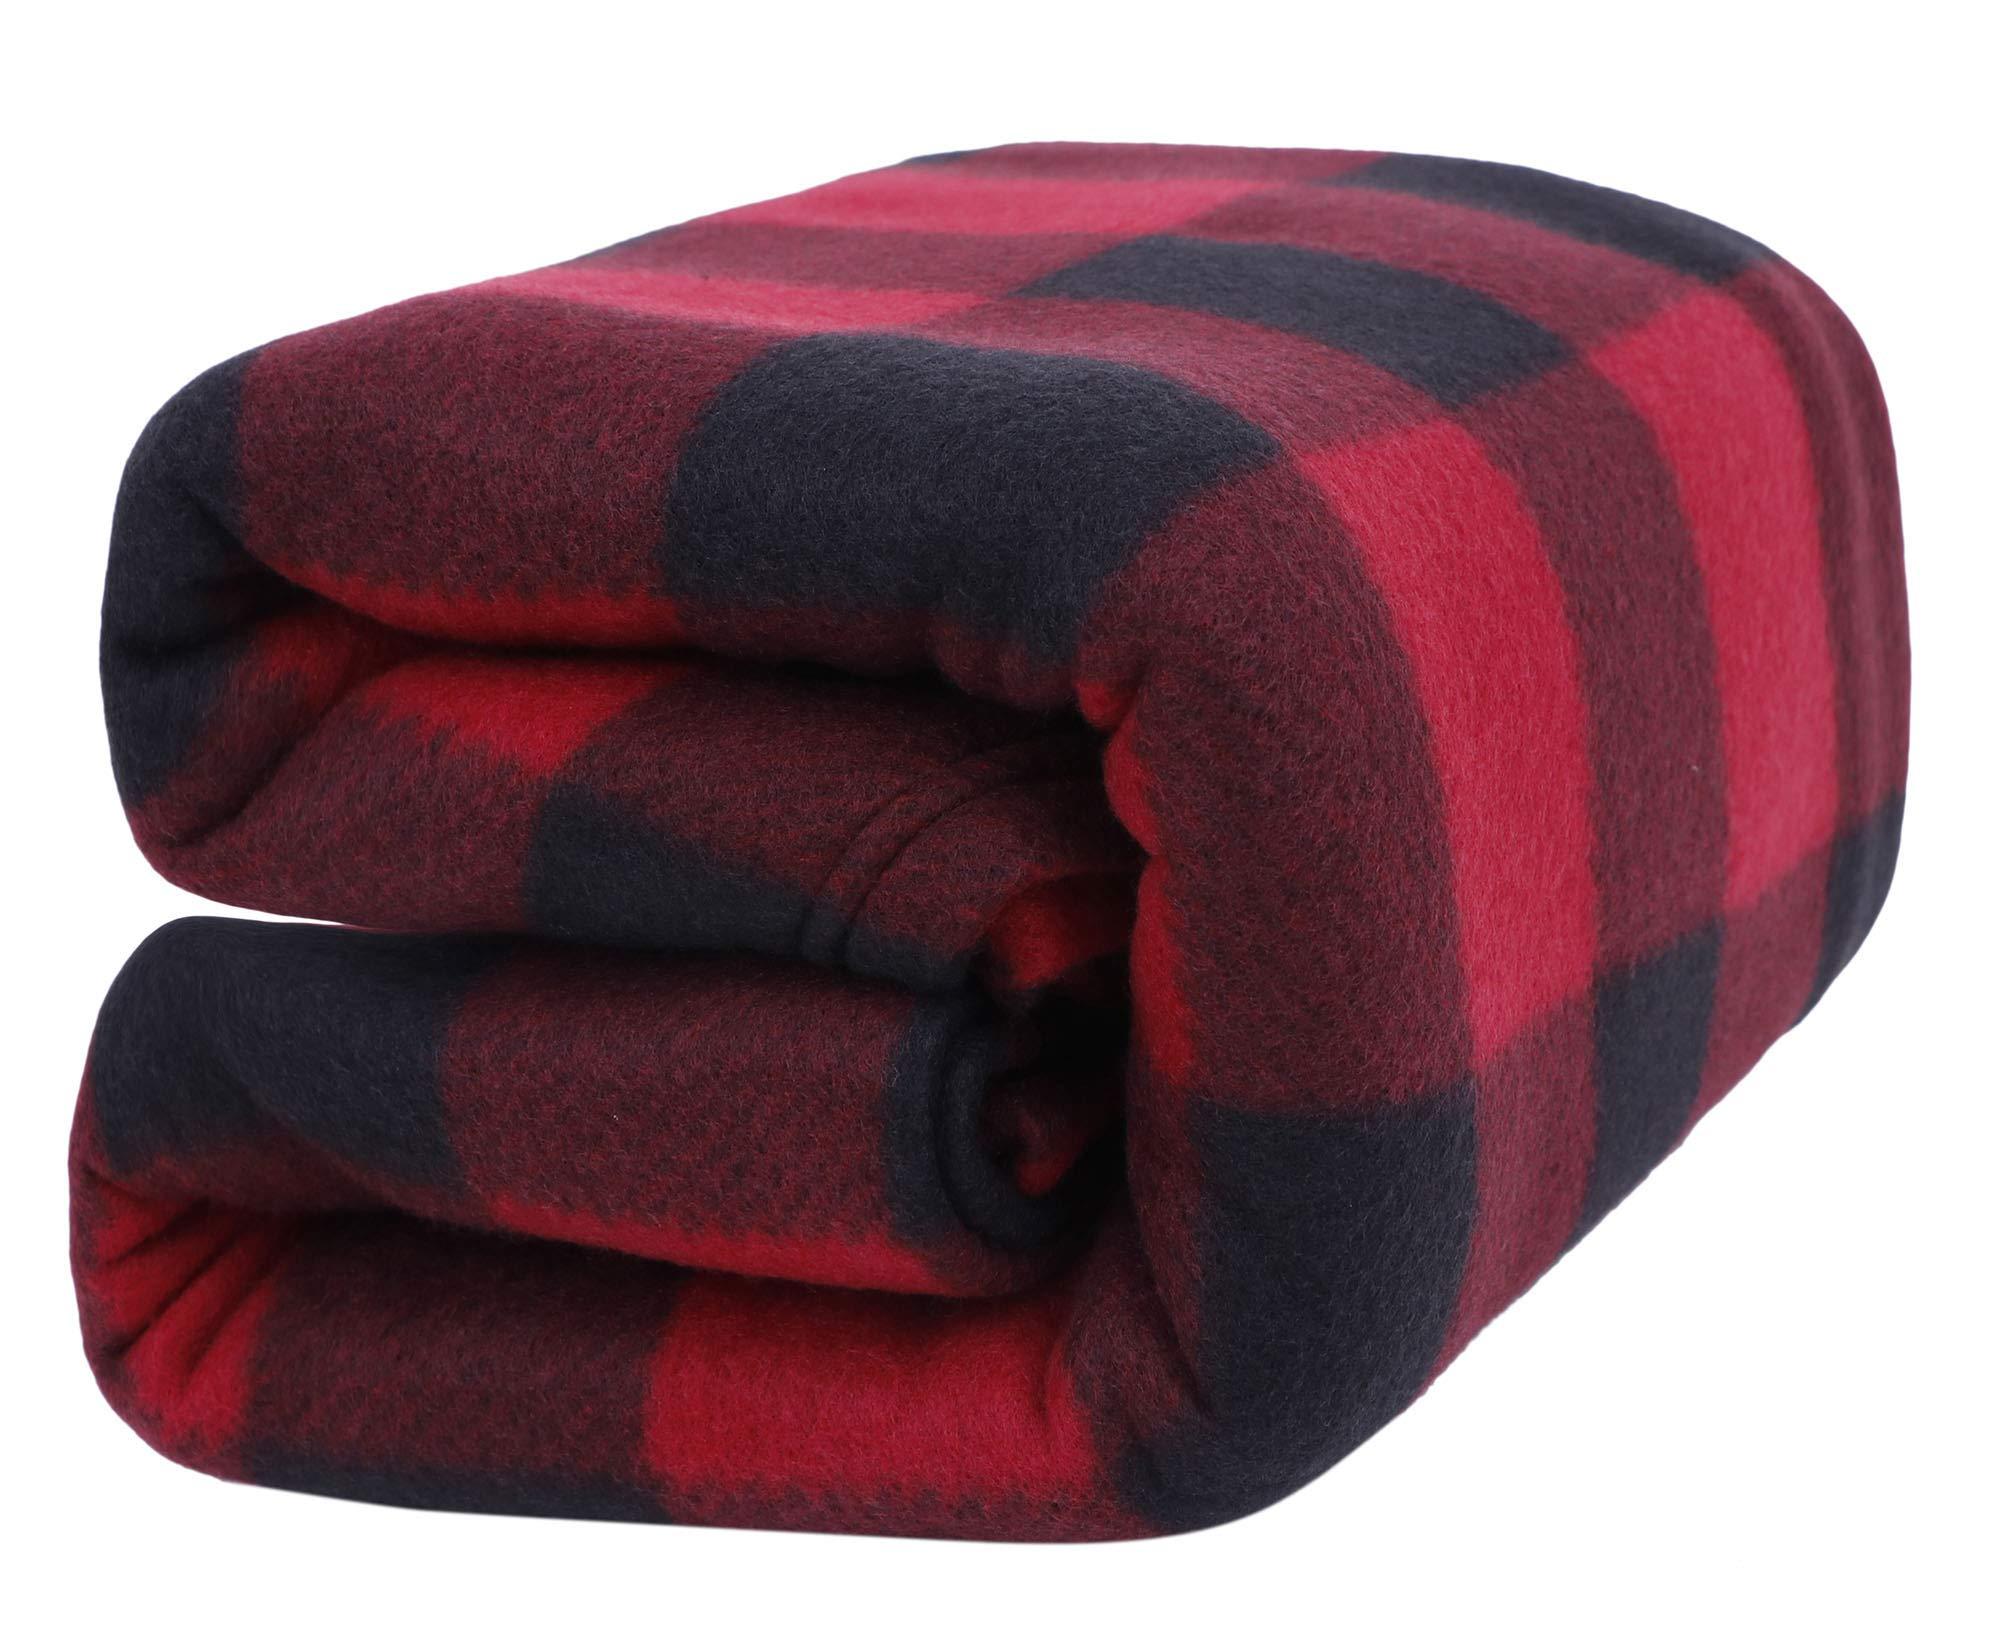 Home Blanket Polar-fleece Blanket Lightweight Warm Blanket, Red